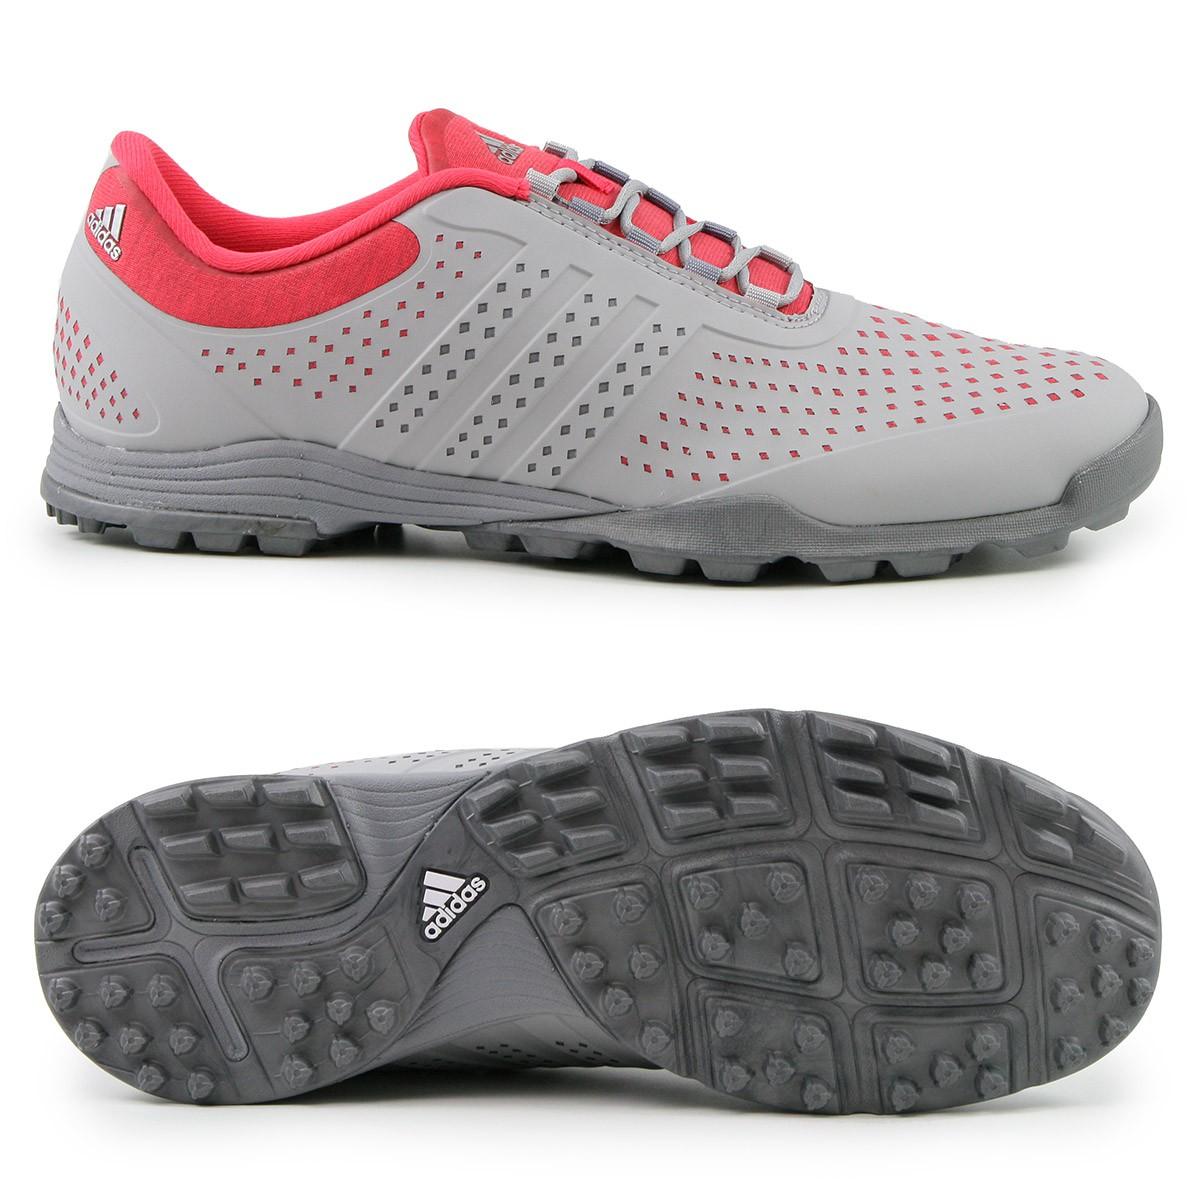 Adidas adipure Sport Damen Golfschuhe, Grau Rot günstig